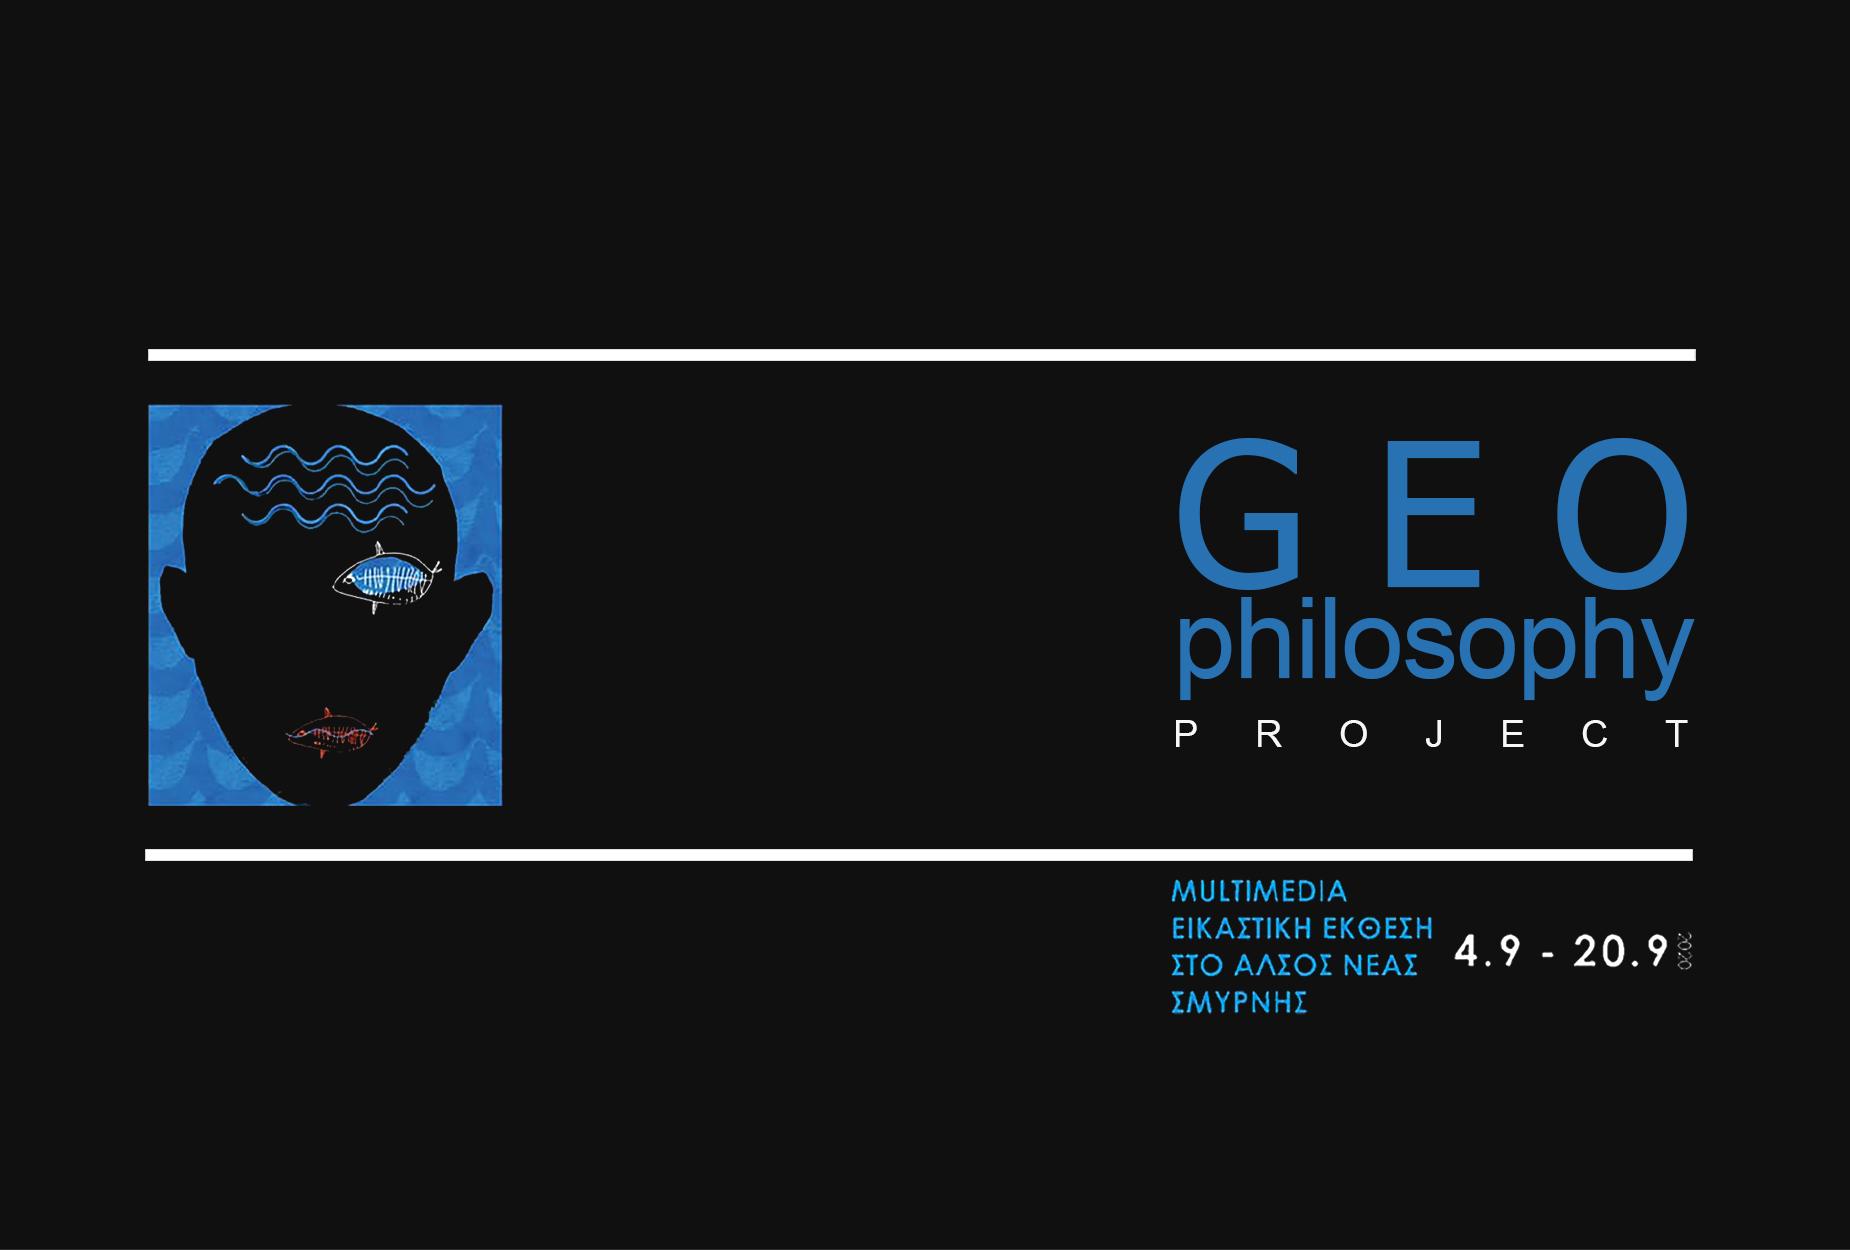 GEO philosophy invitation web